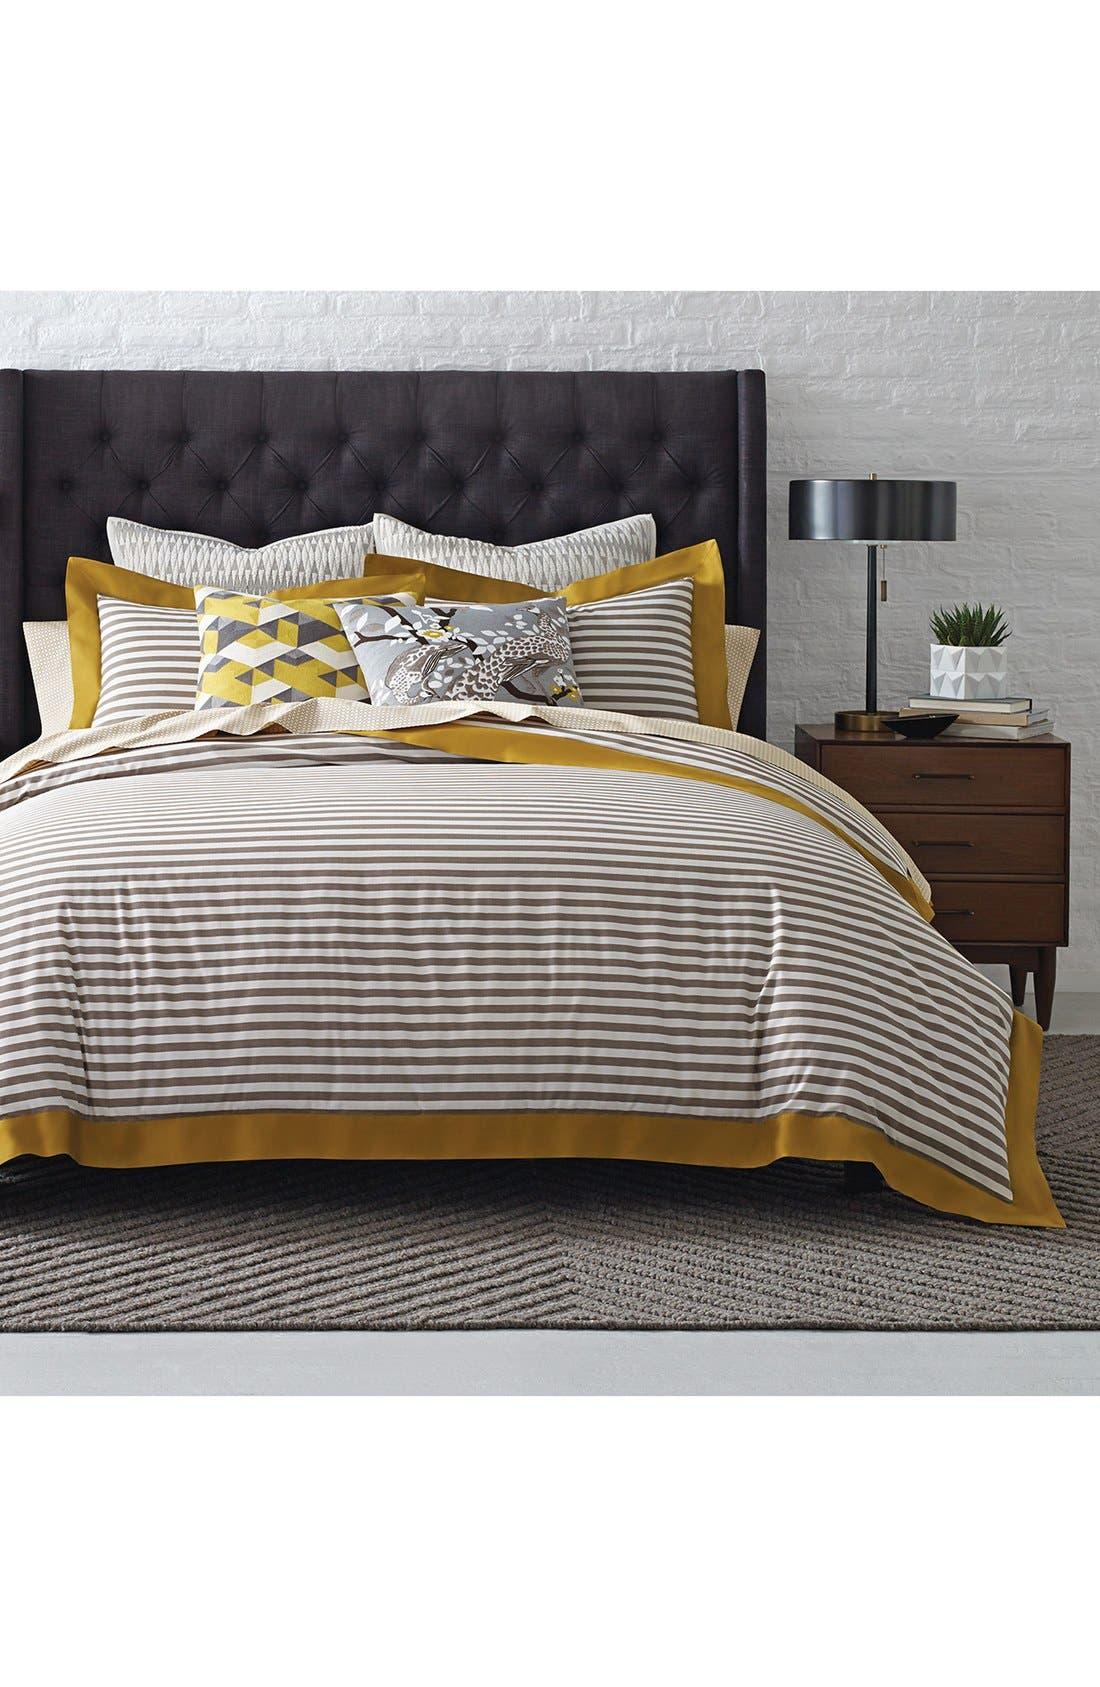 'Draper Stripe' Duvet Cover,                         Main,                         color, Yellow/ Multi